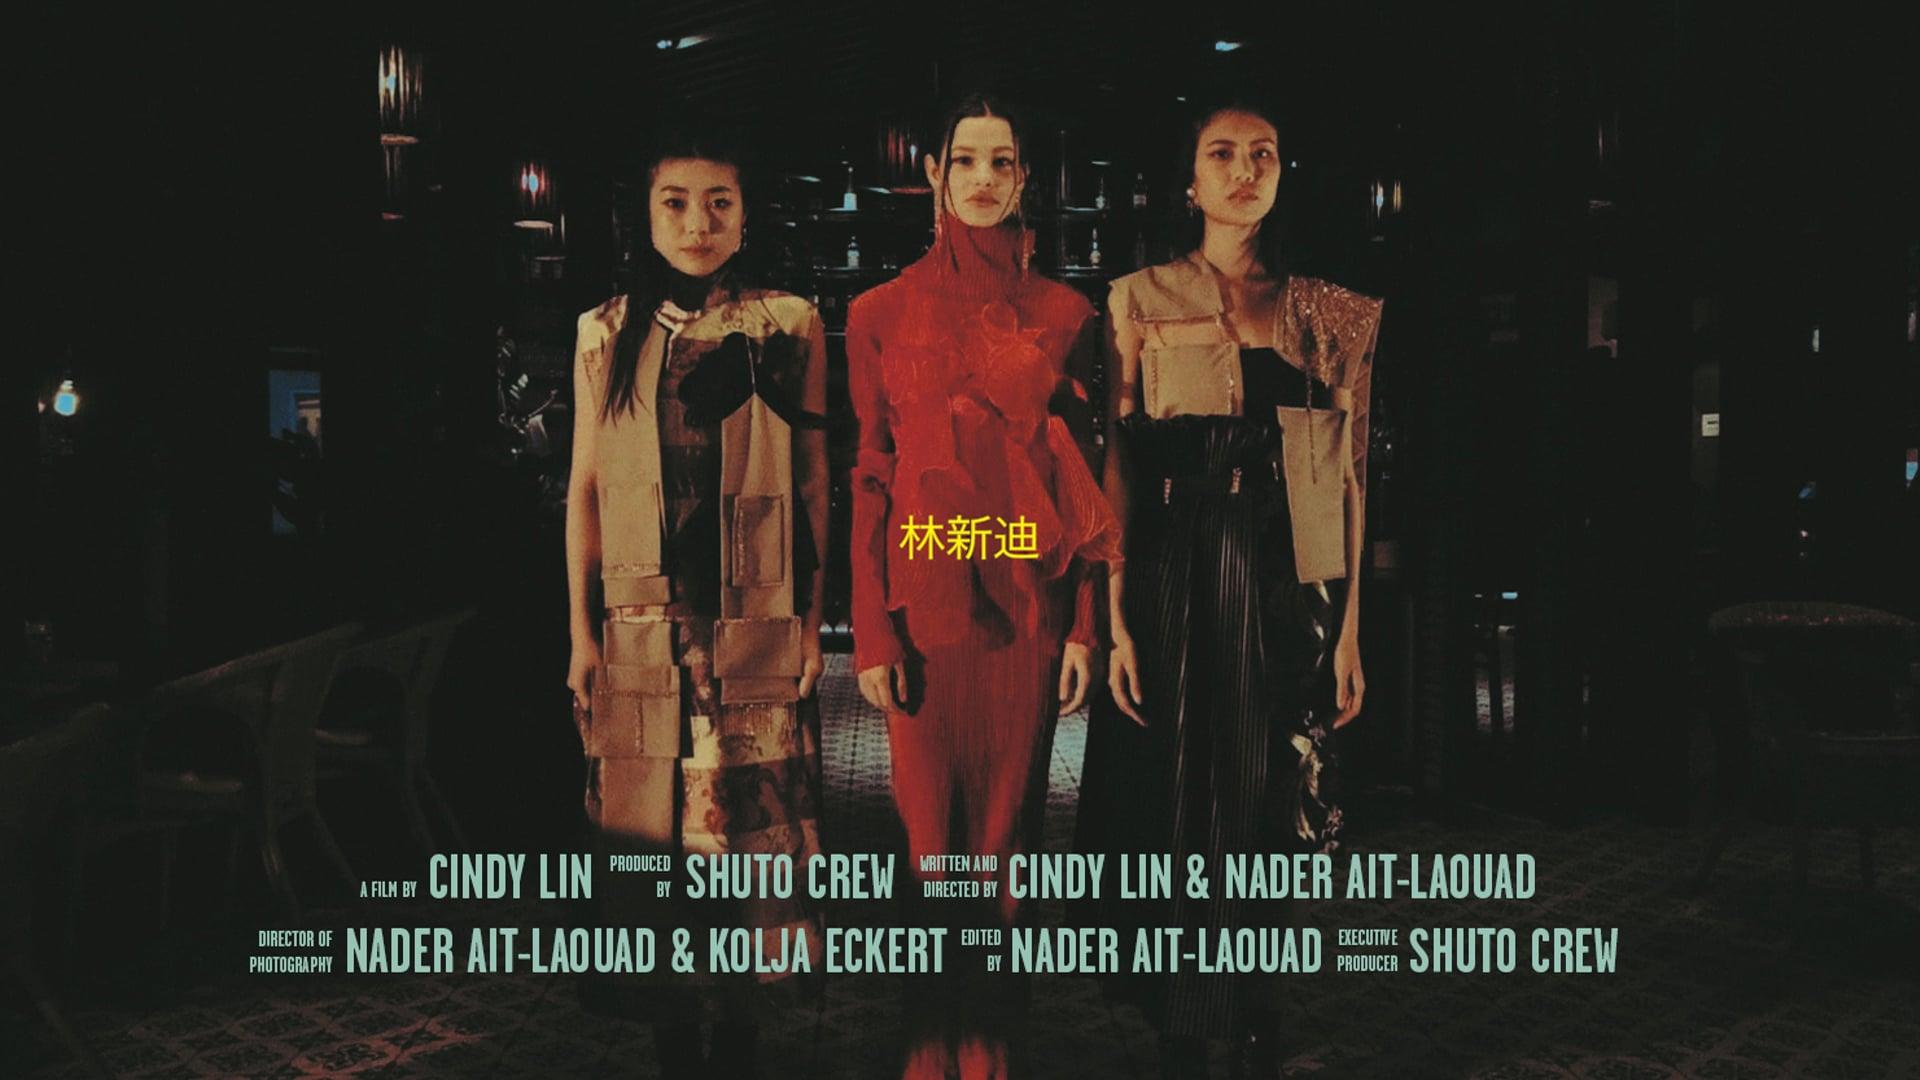 Cindy Lin 林新迪